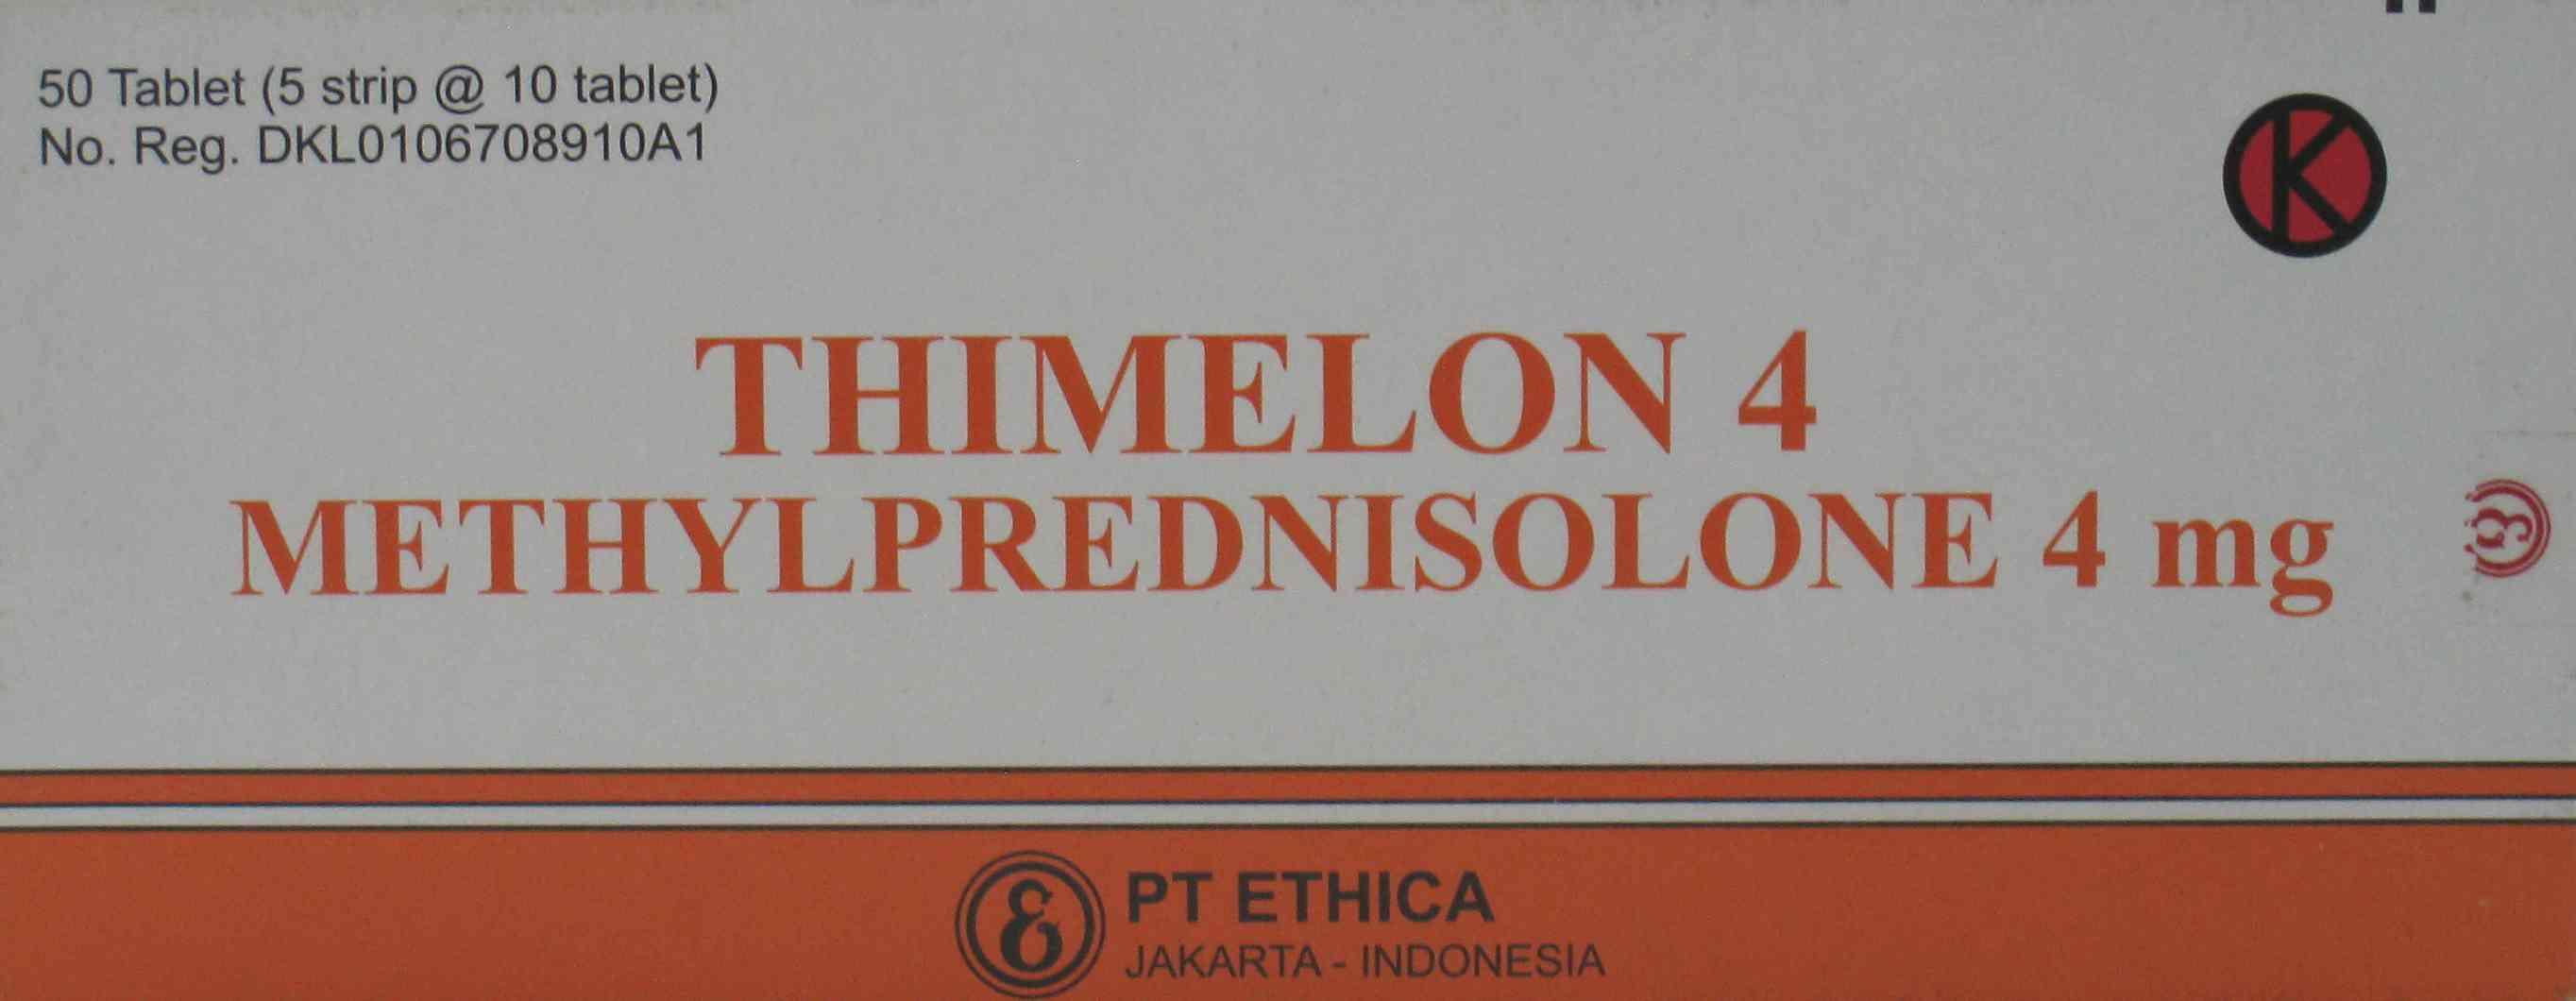 THIMELON 4 MG 10 TABLET